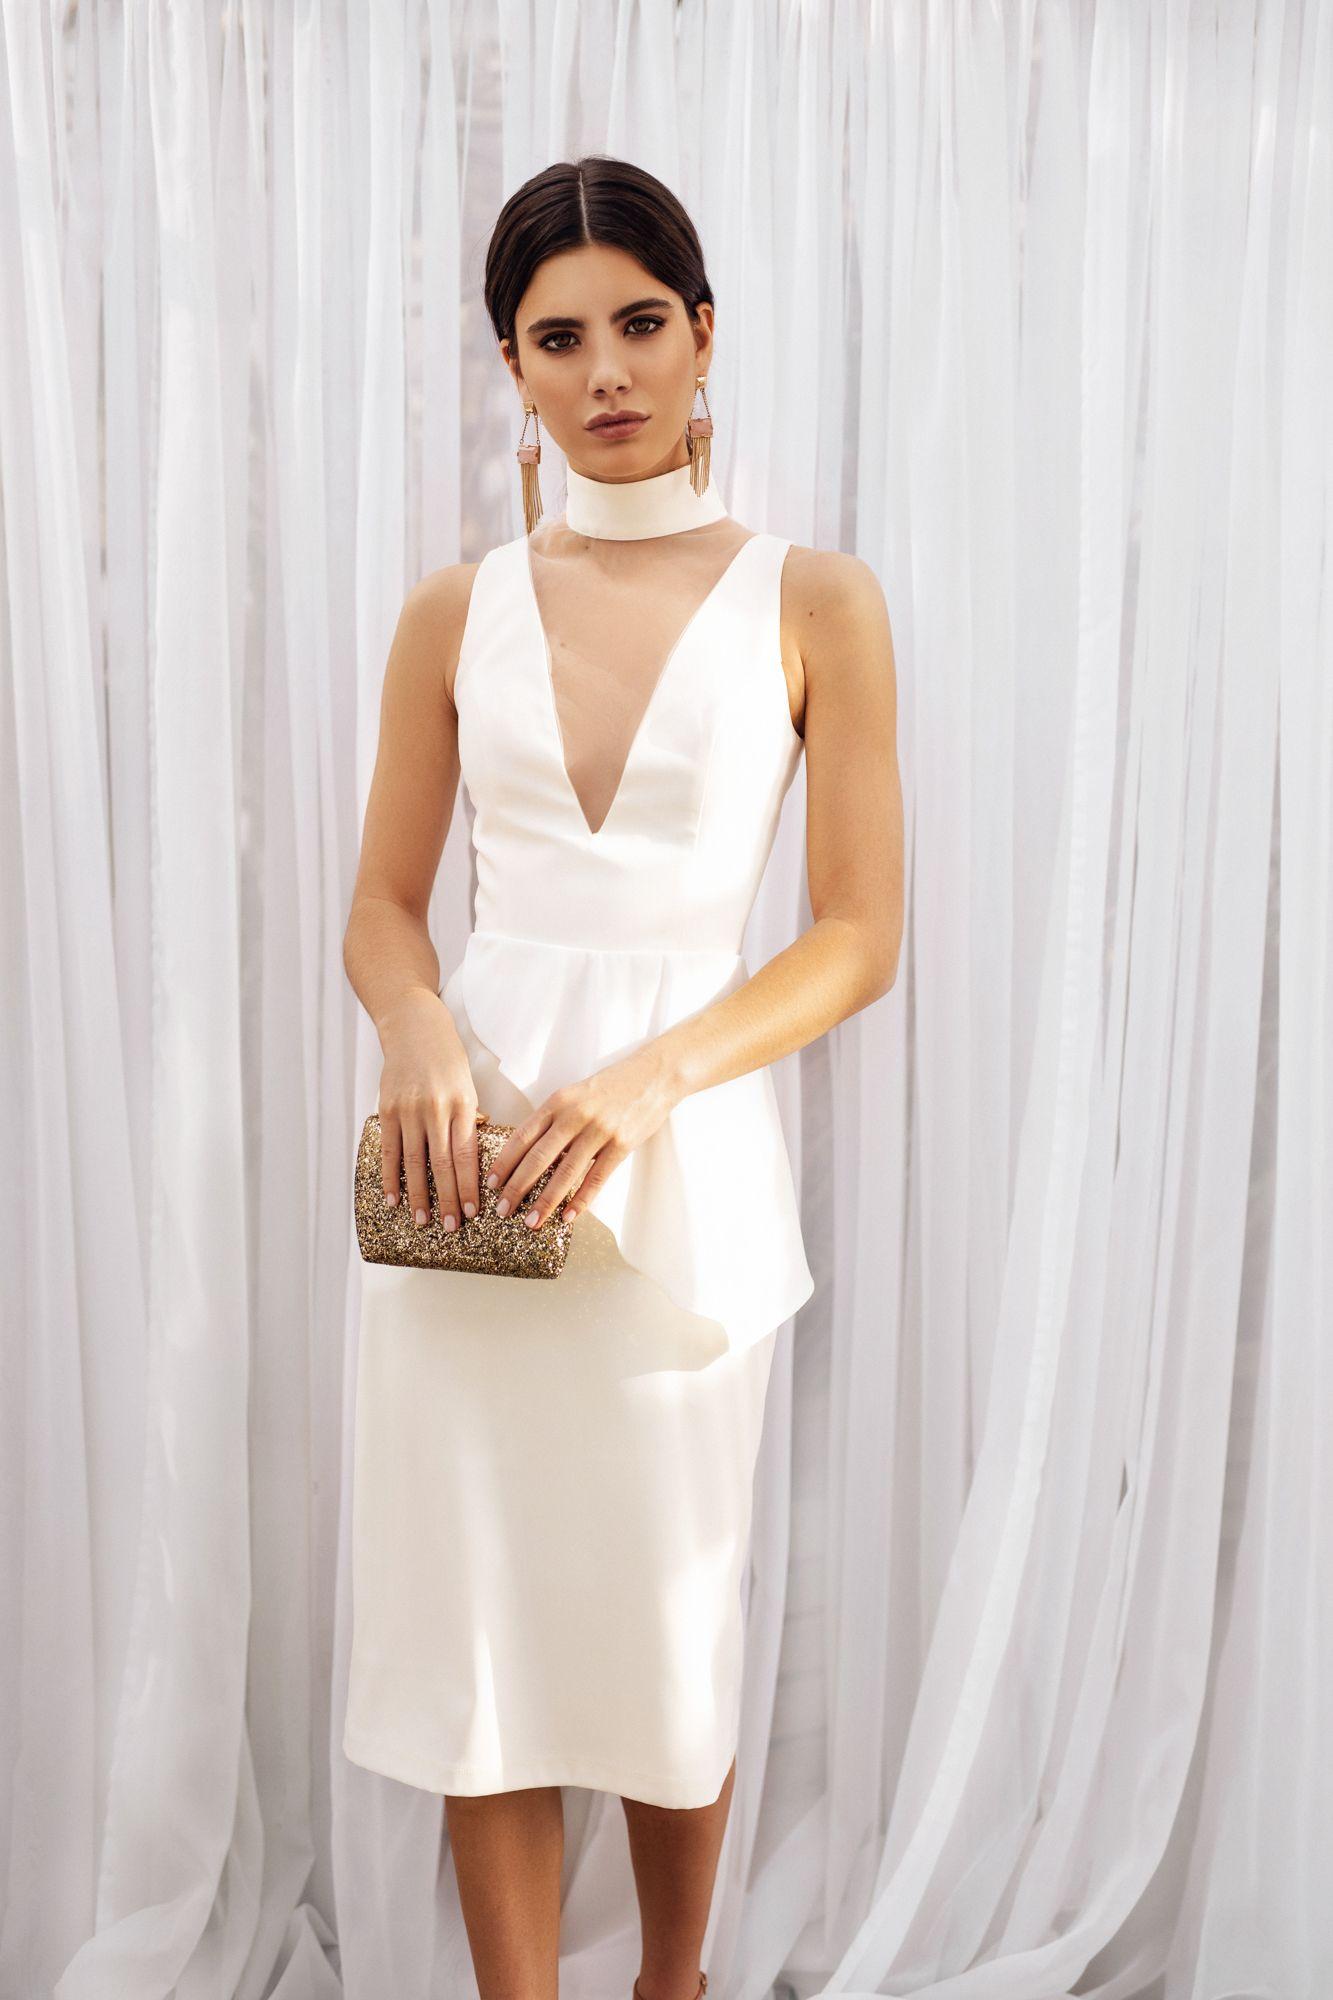 Midi Satin Wedding Dress Minimalist Simple Bridal Gown Etsy Simple Bridal Gowns Unusual Wedding Dresses Amazing Wedding Dress [ 2000 x 1333 Pixel ]